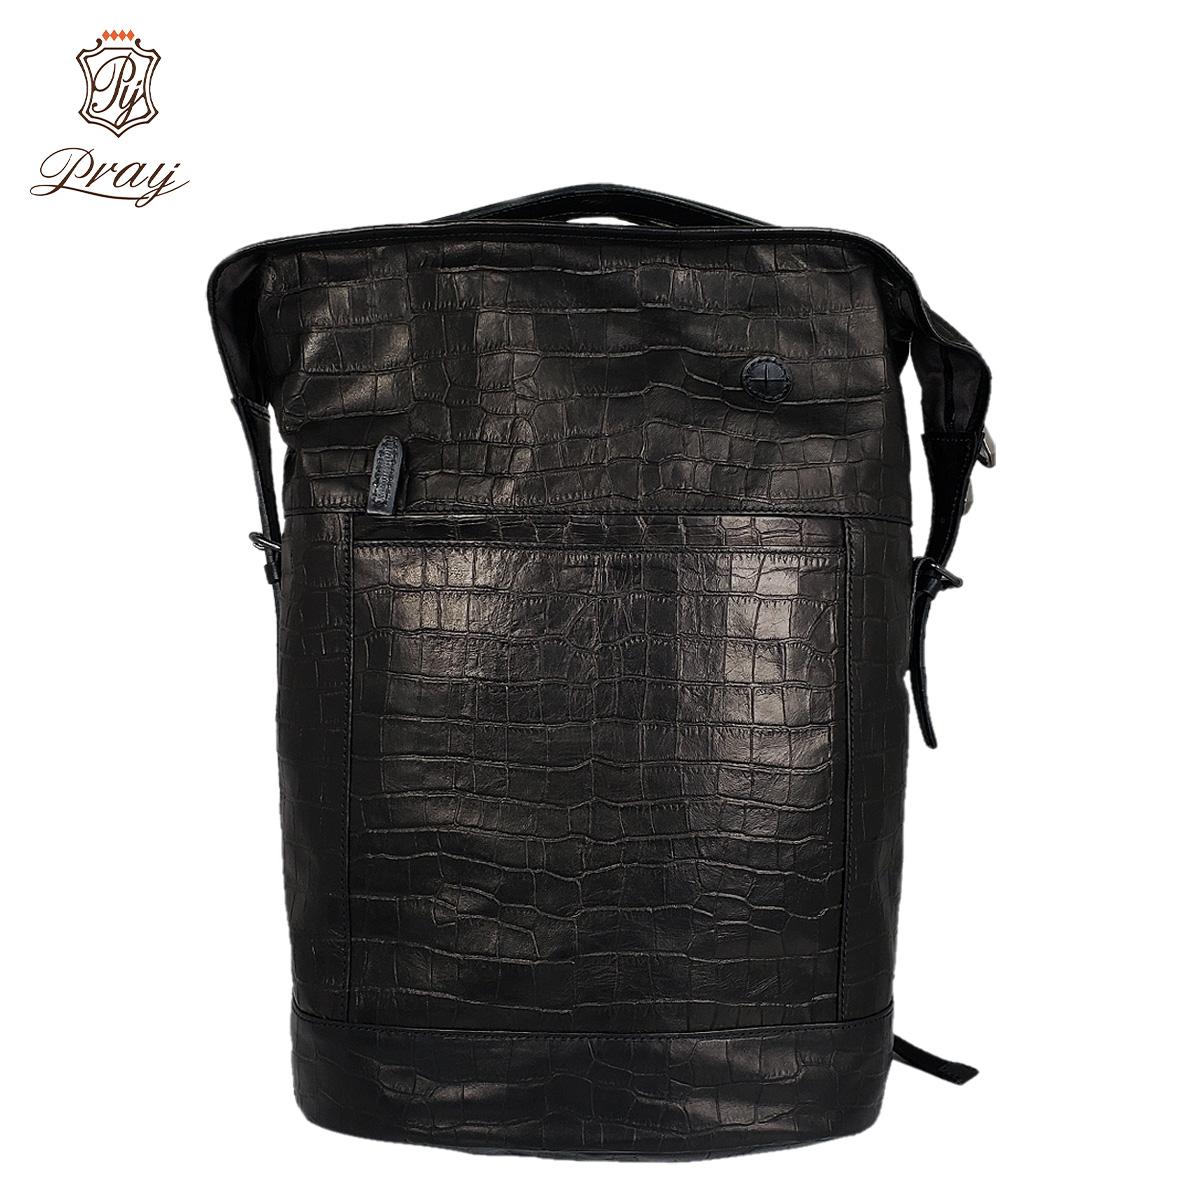 PRAY プレイ リュック バッグ バックパック メンズ RUCK SACK ブラック 黒 PRBP-301 [4/6 新入荷]